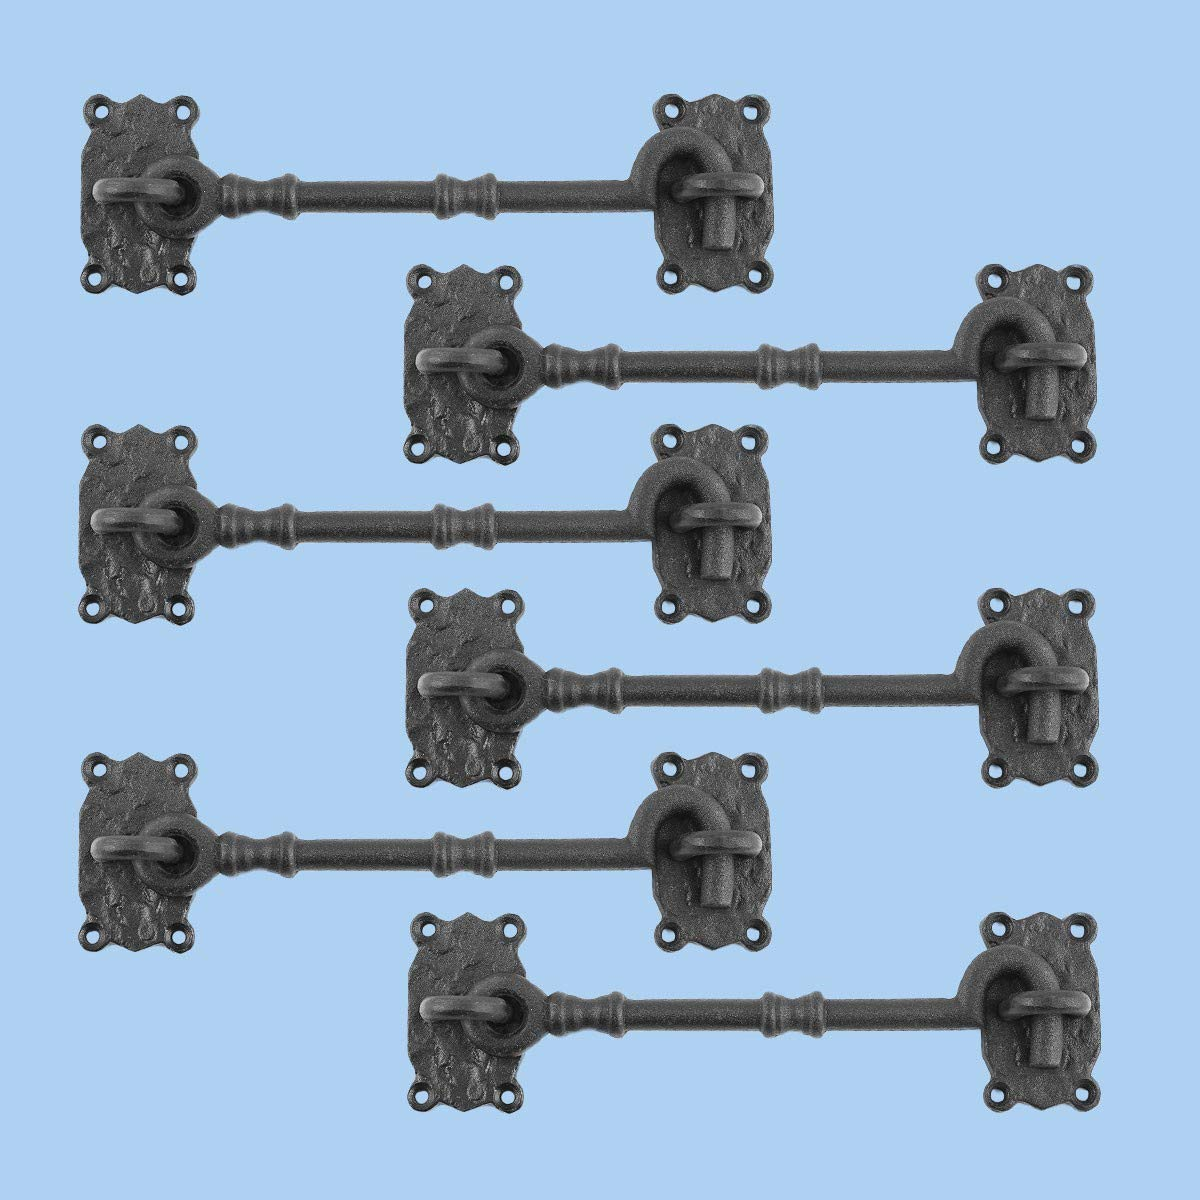 Renovators Supply Cabin Privacy Hook Eye Latch Black Iron 7.25 Inch Set of 3